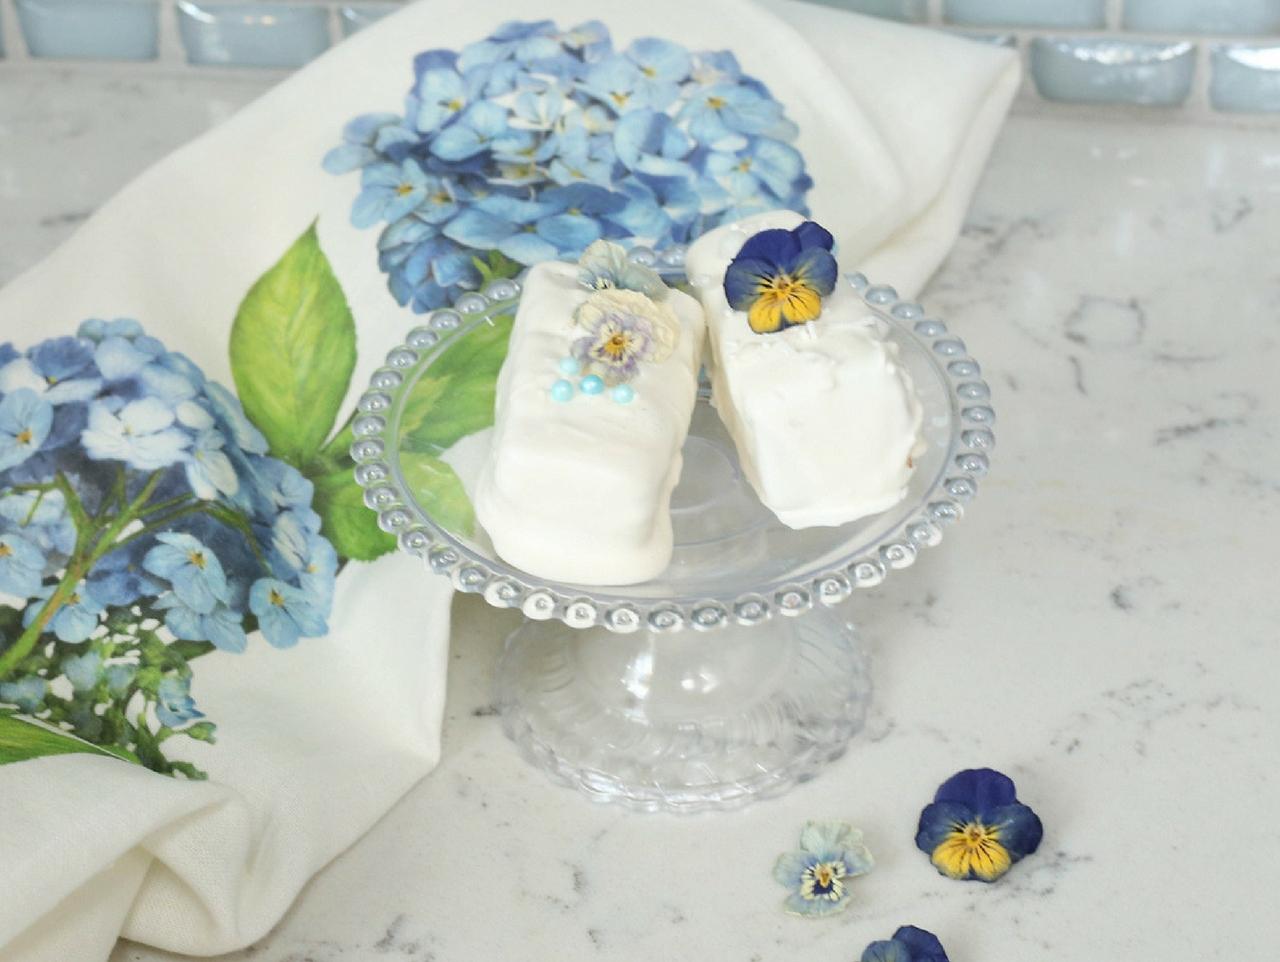 Luxury Wedding Favors Edible Pictures - Wedding Idea 2018 ...